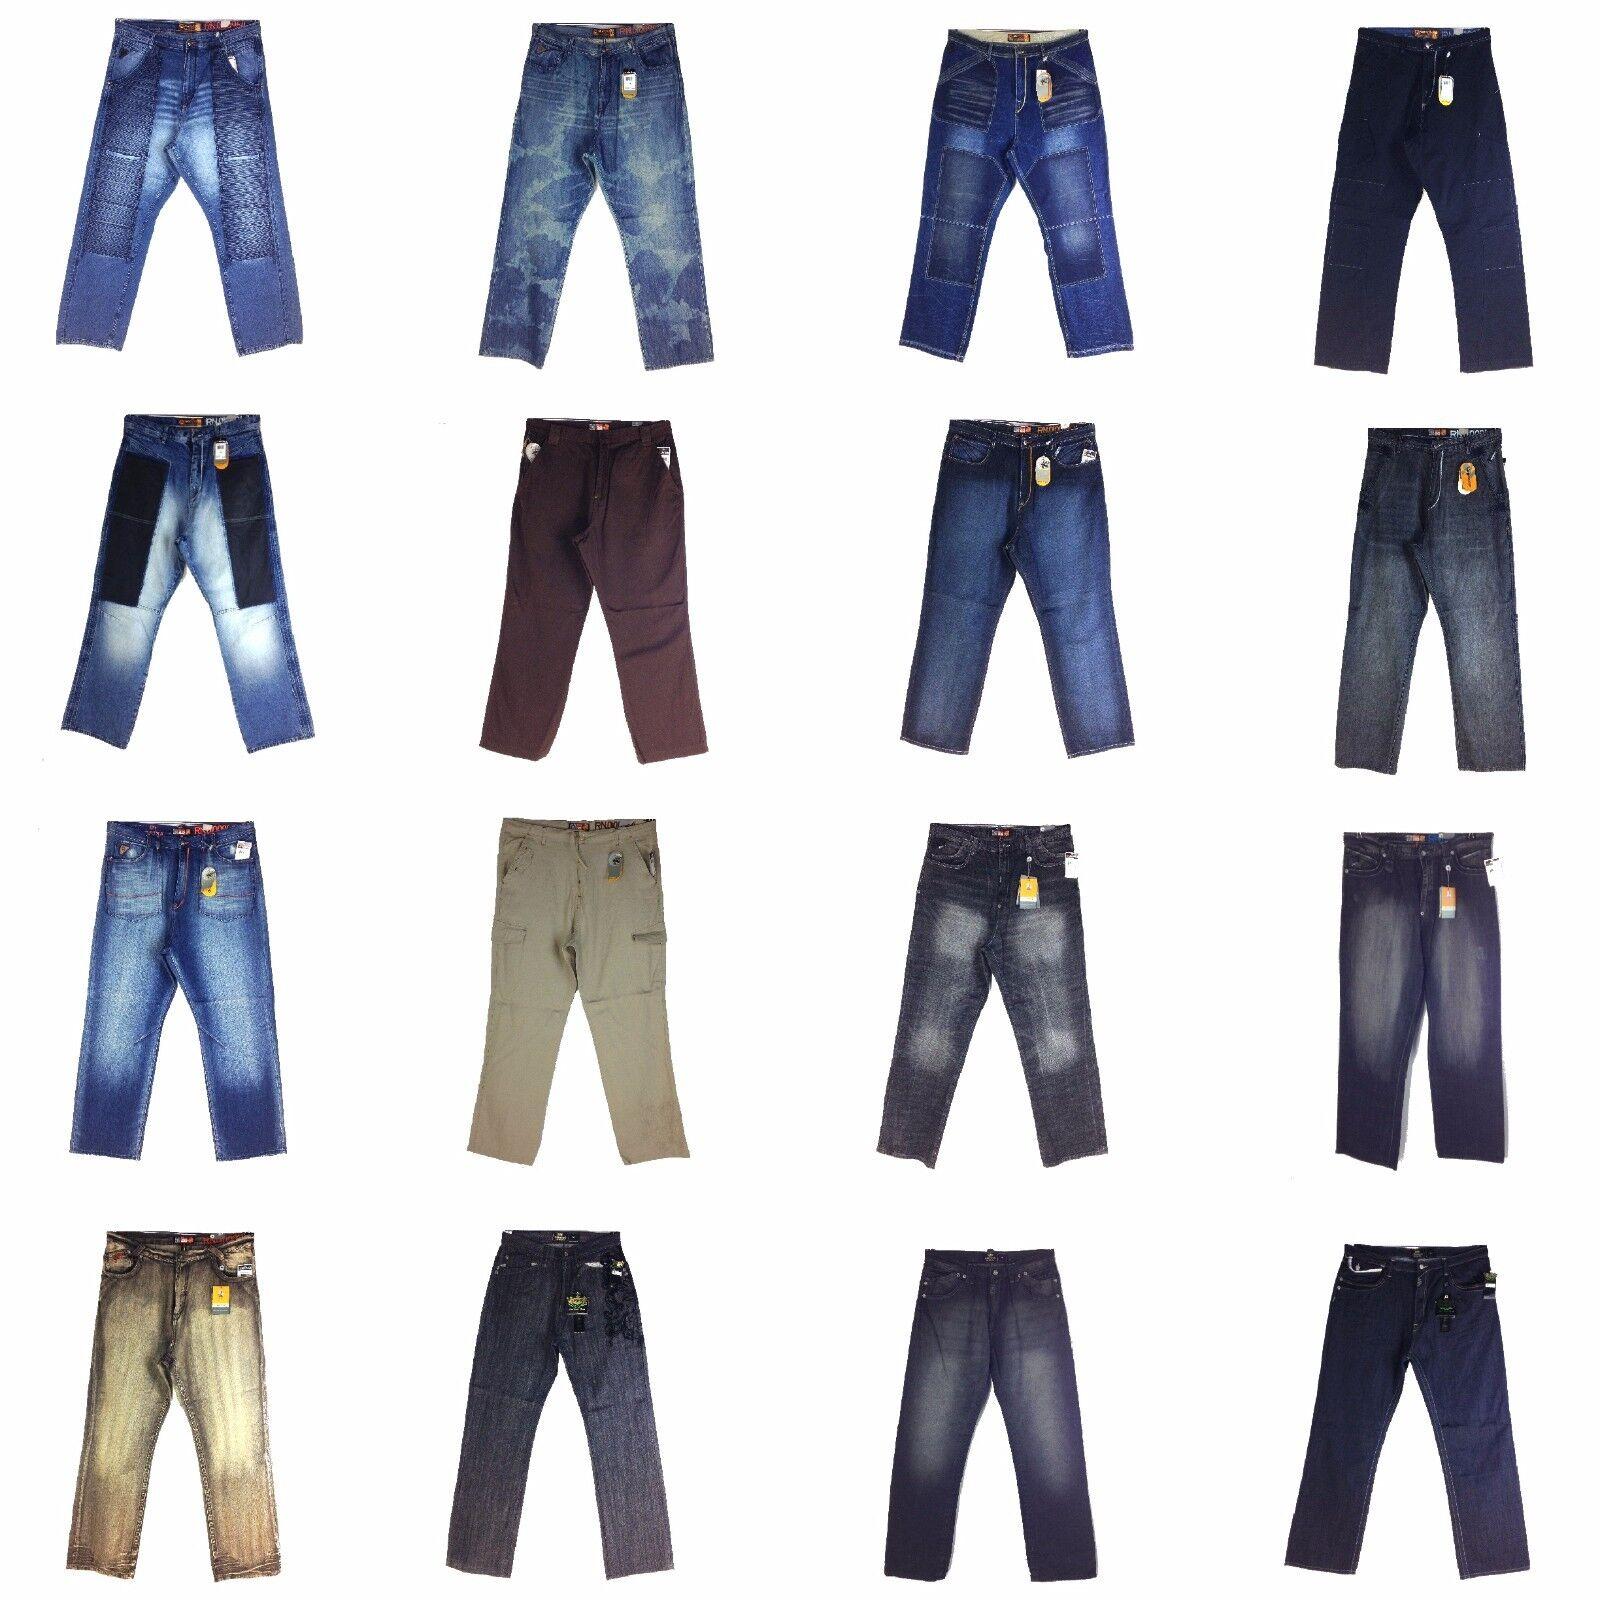 AKADEMIKS, Designer Collection, Vintage Men's Assorted Styles Group [1]